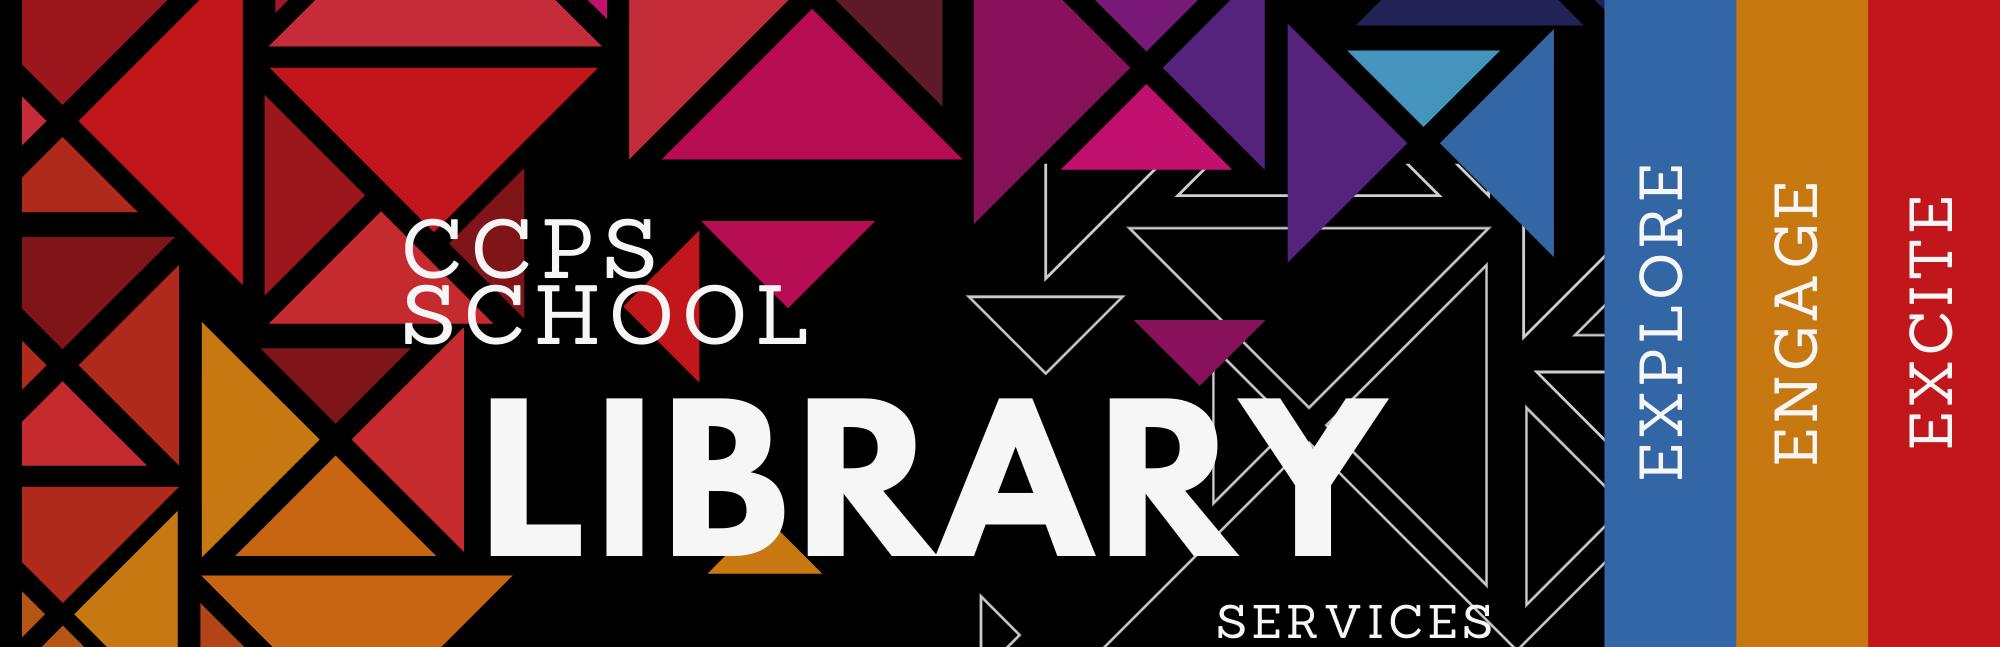 ccps school libraries banner